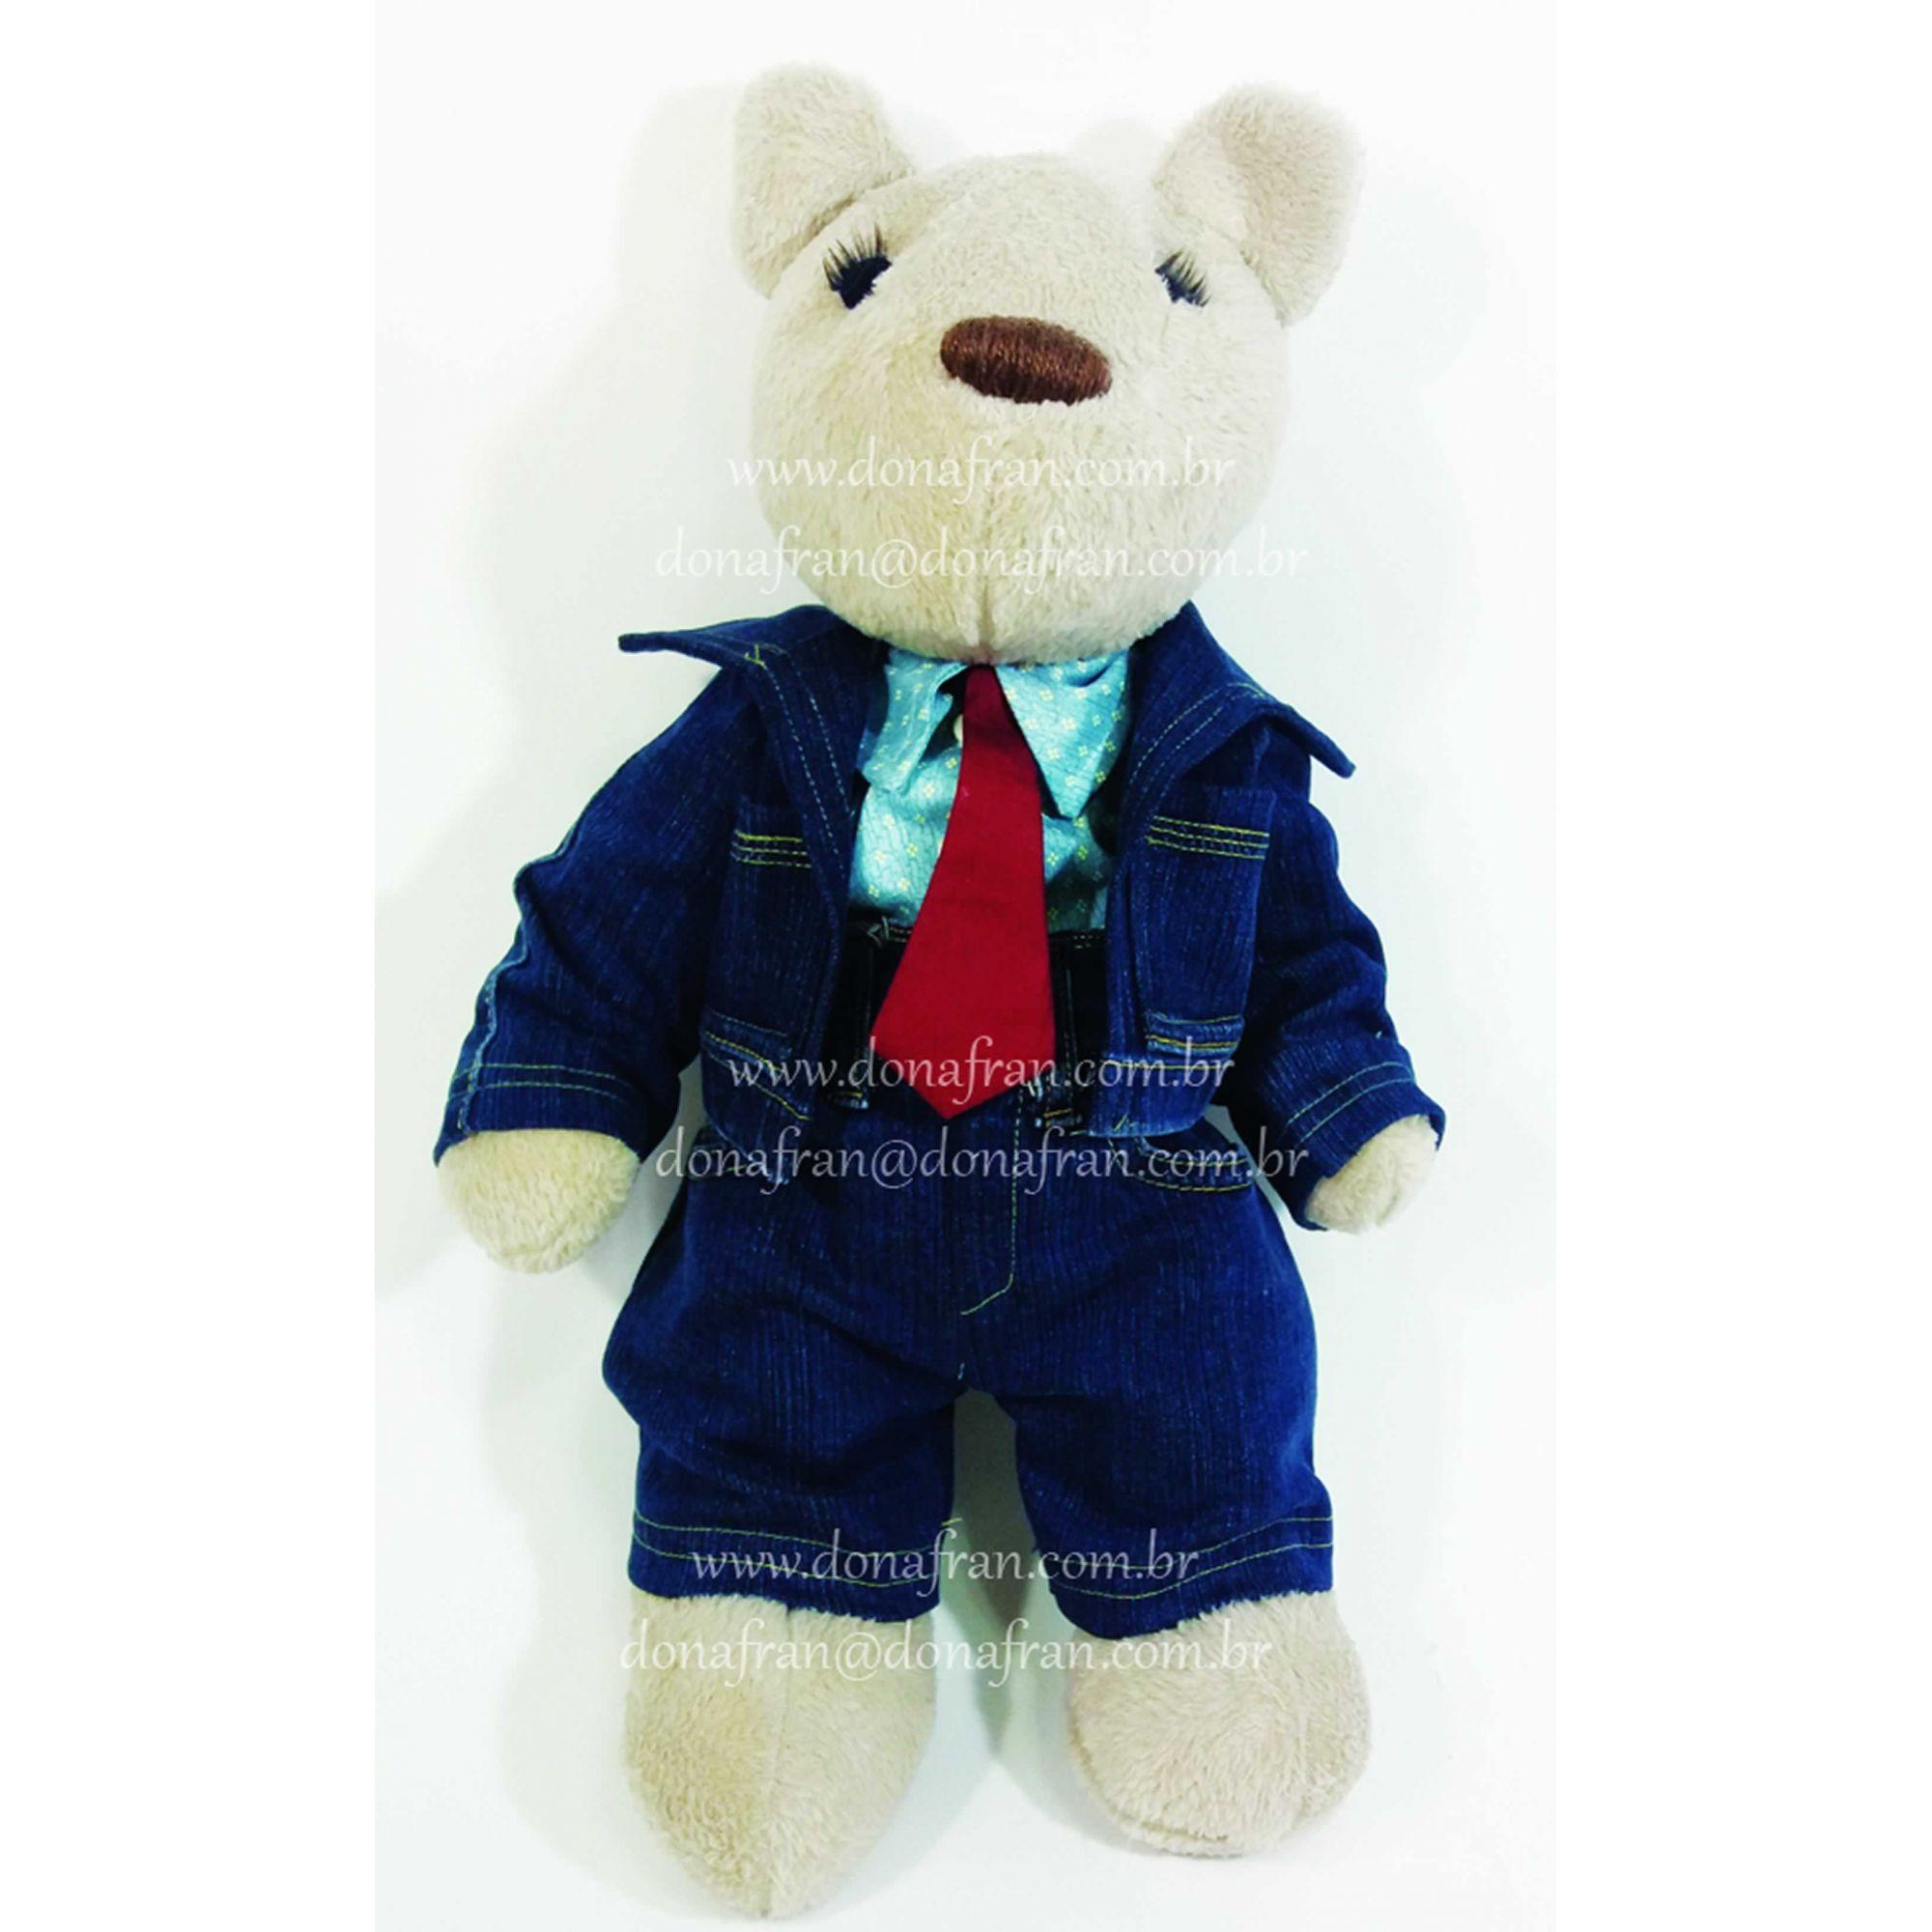 Projeto Urso Baltazar